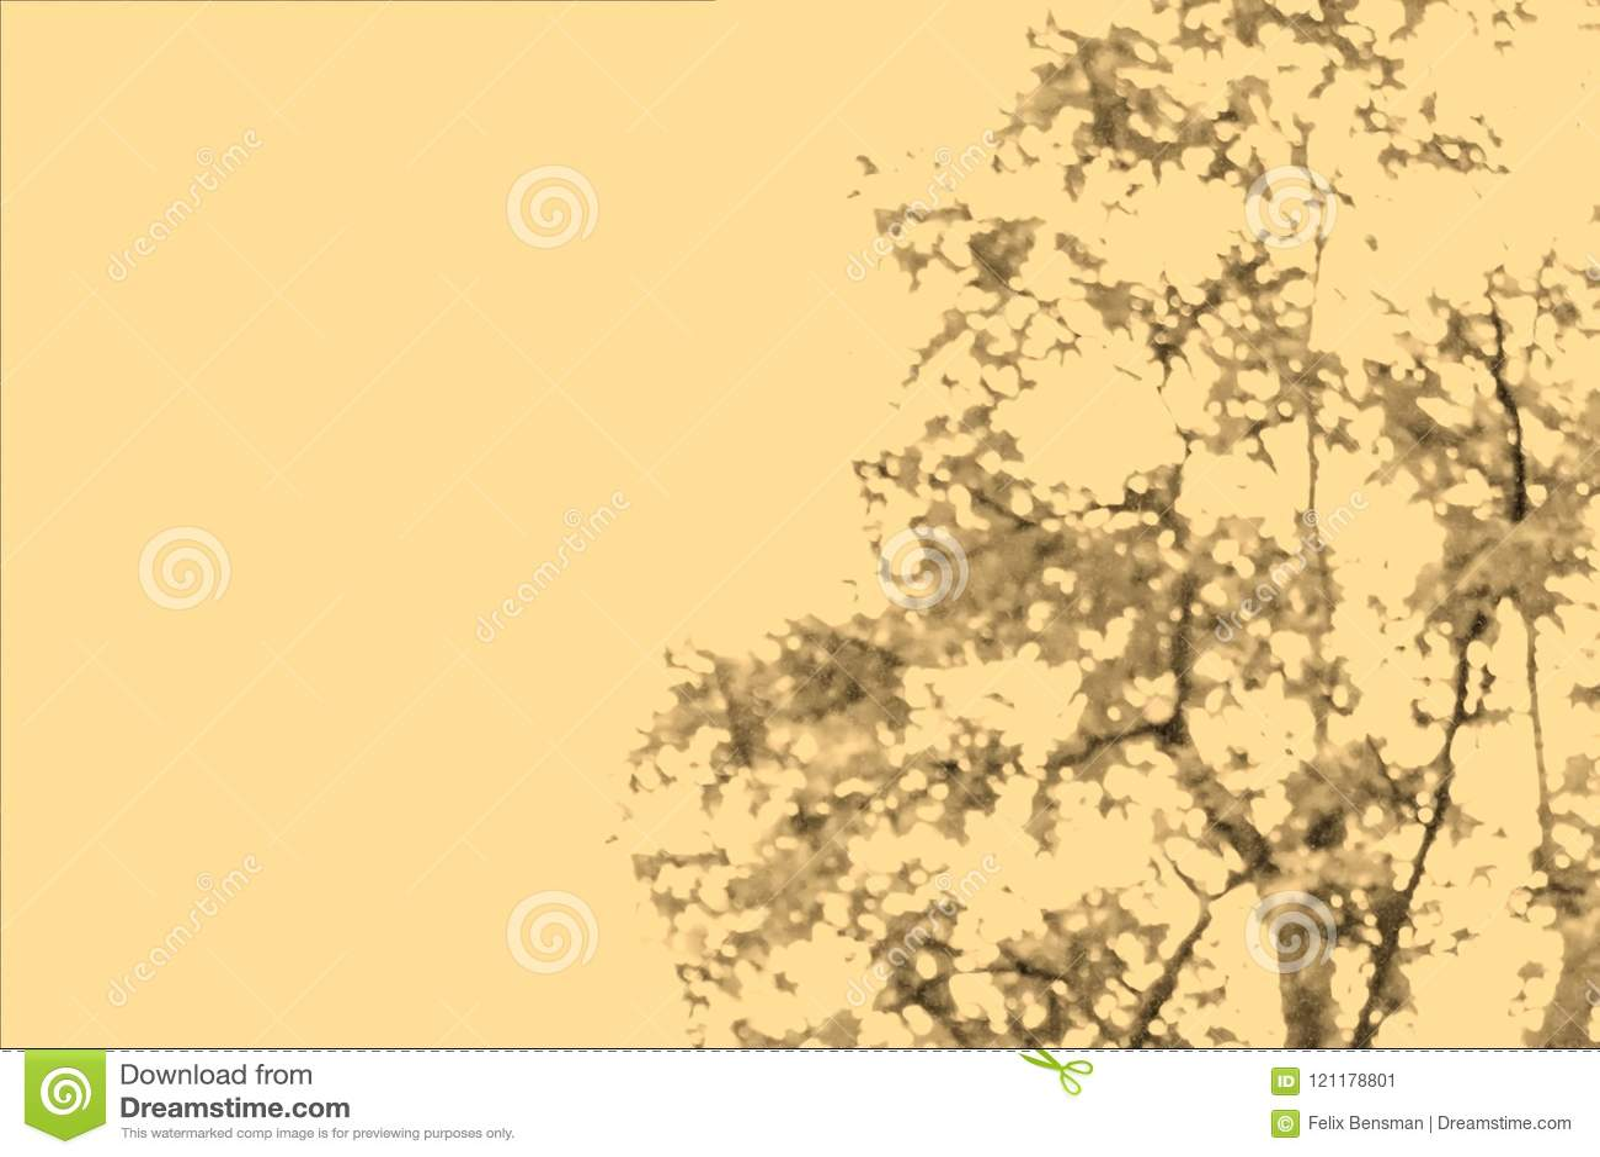 Samenvatting vaag beeld van groene gebladerteachtergrond met oud